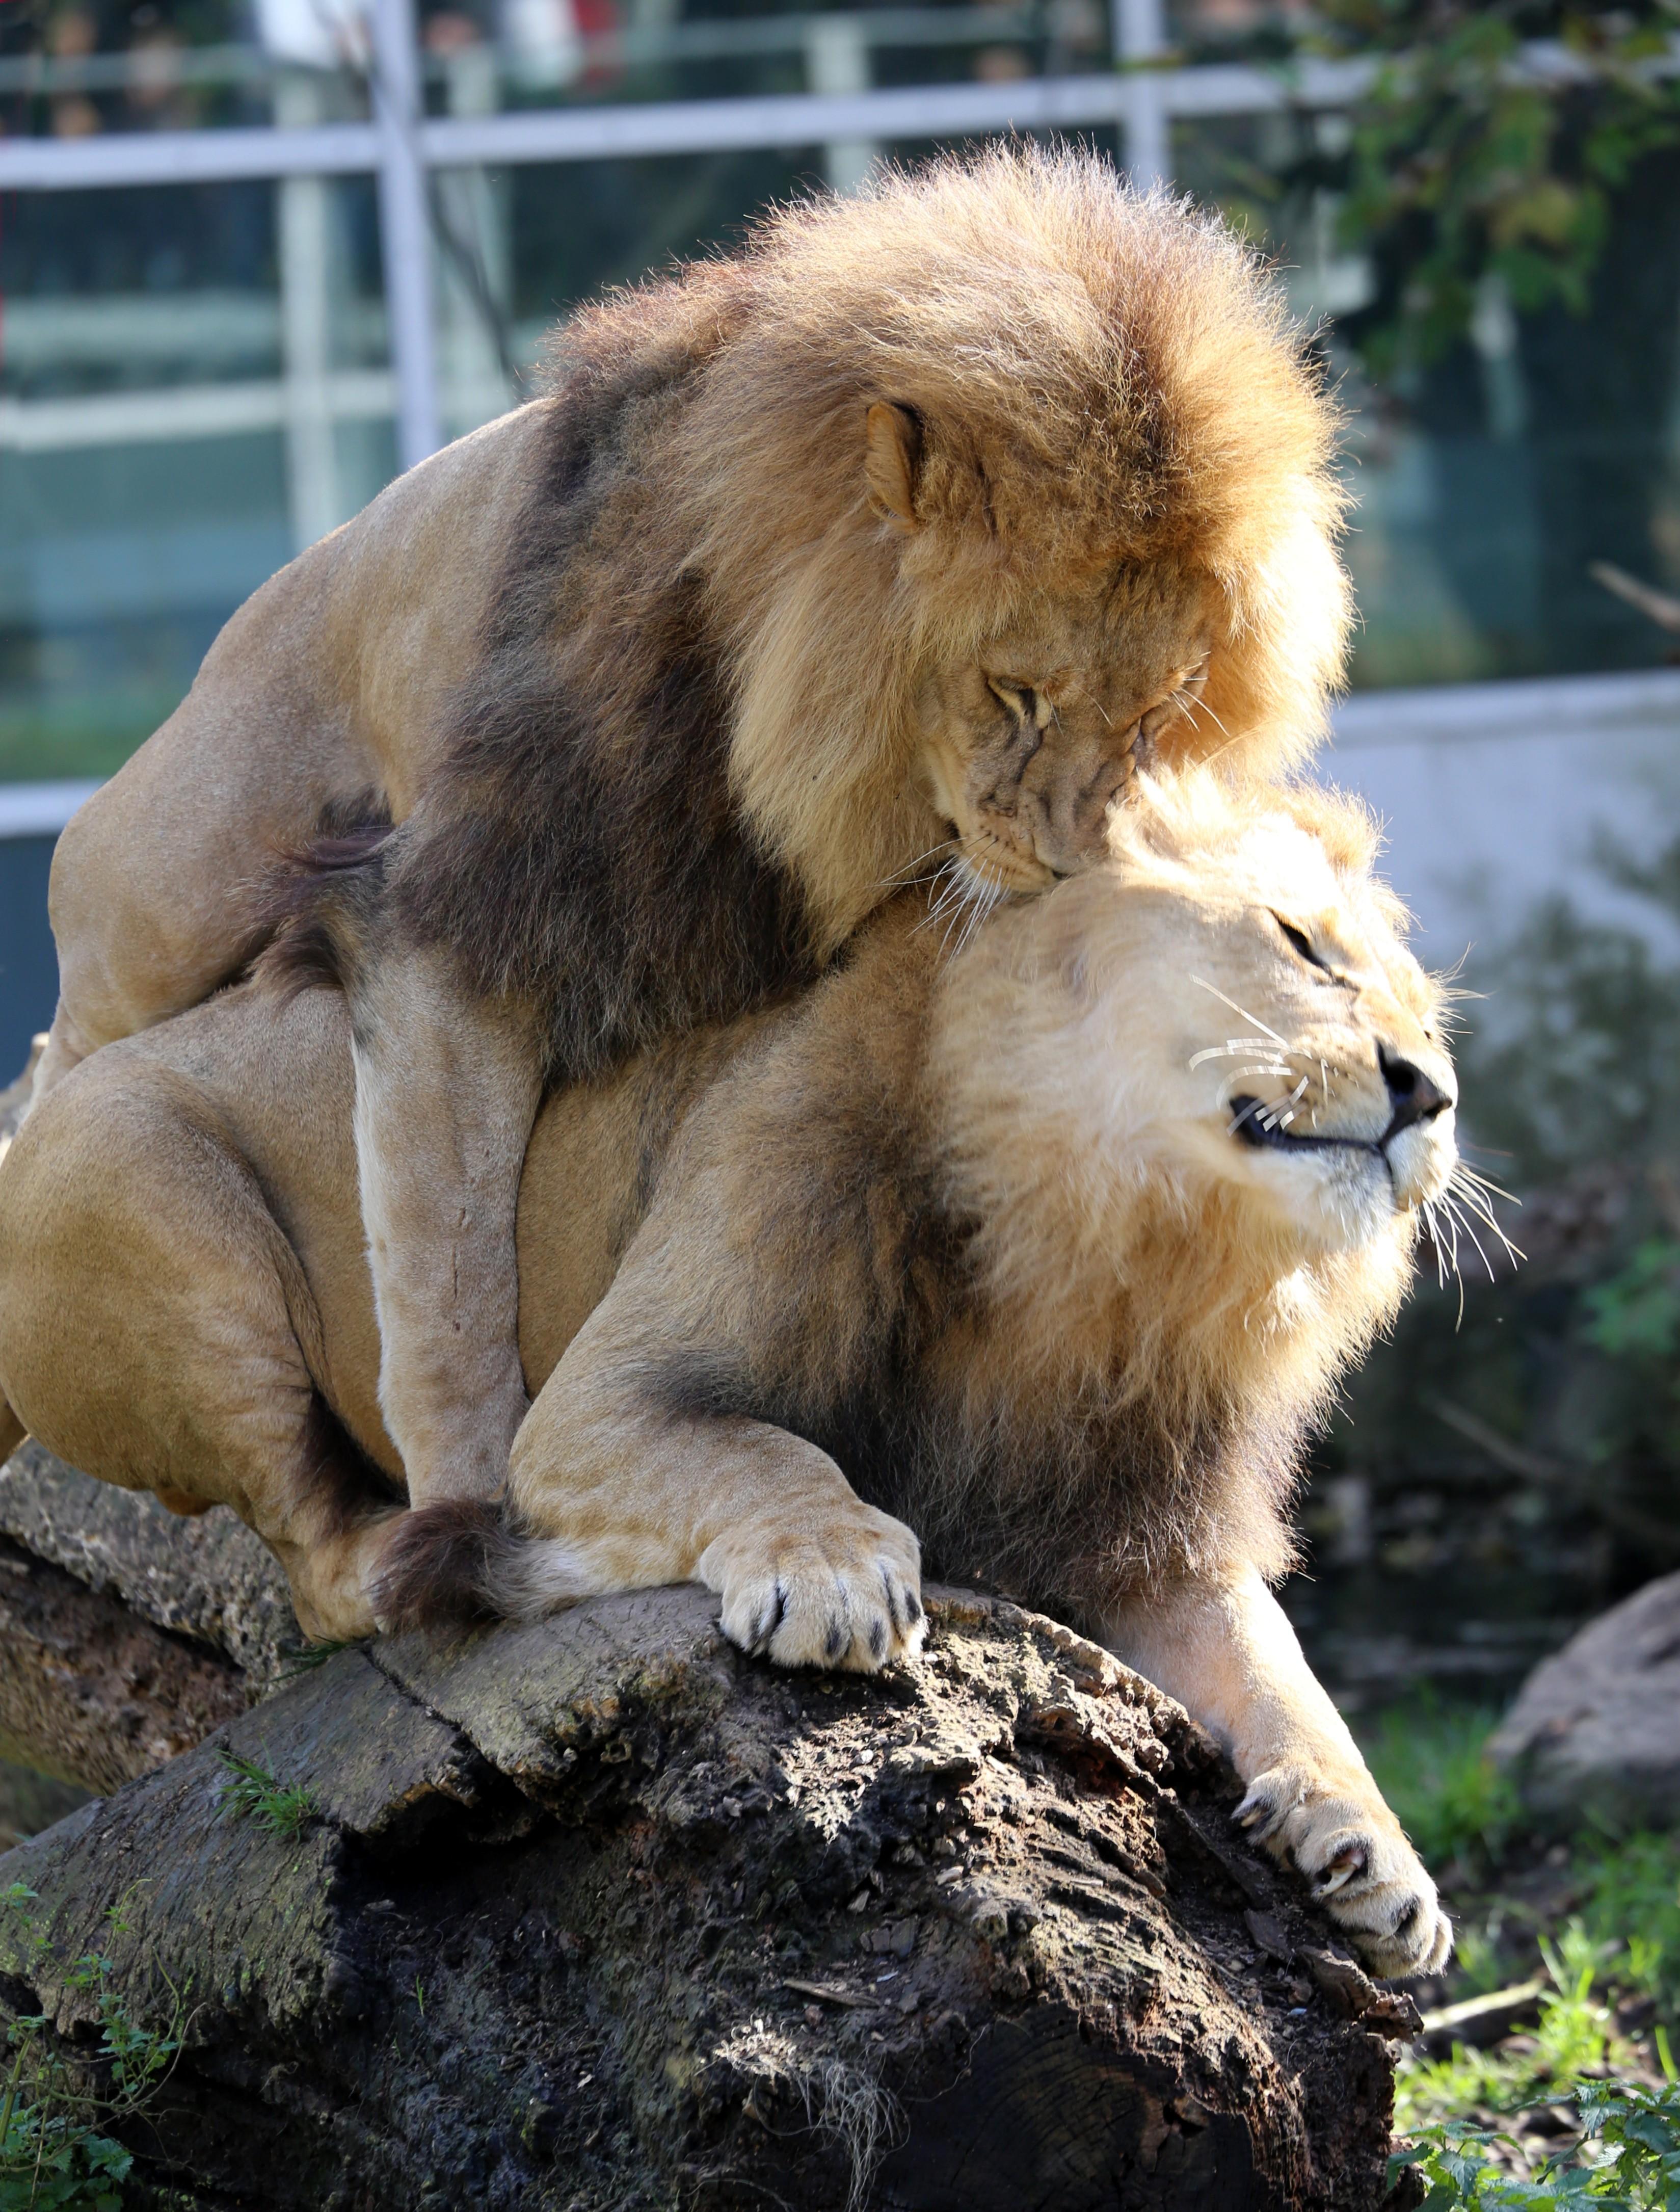 Zwei_junge_maennliche_Loewen_Panthera_leo_Tierpark_Hellabrunn-4 The History of Homosexuality: Being Gay